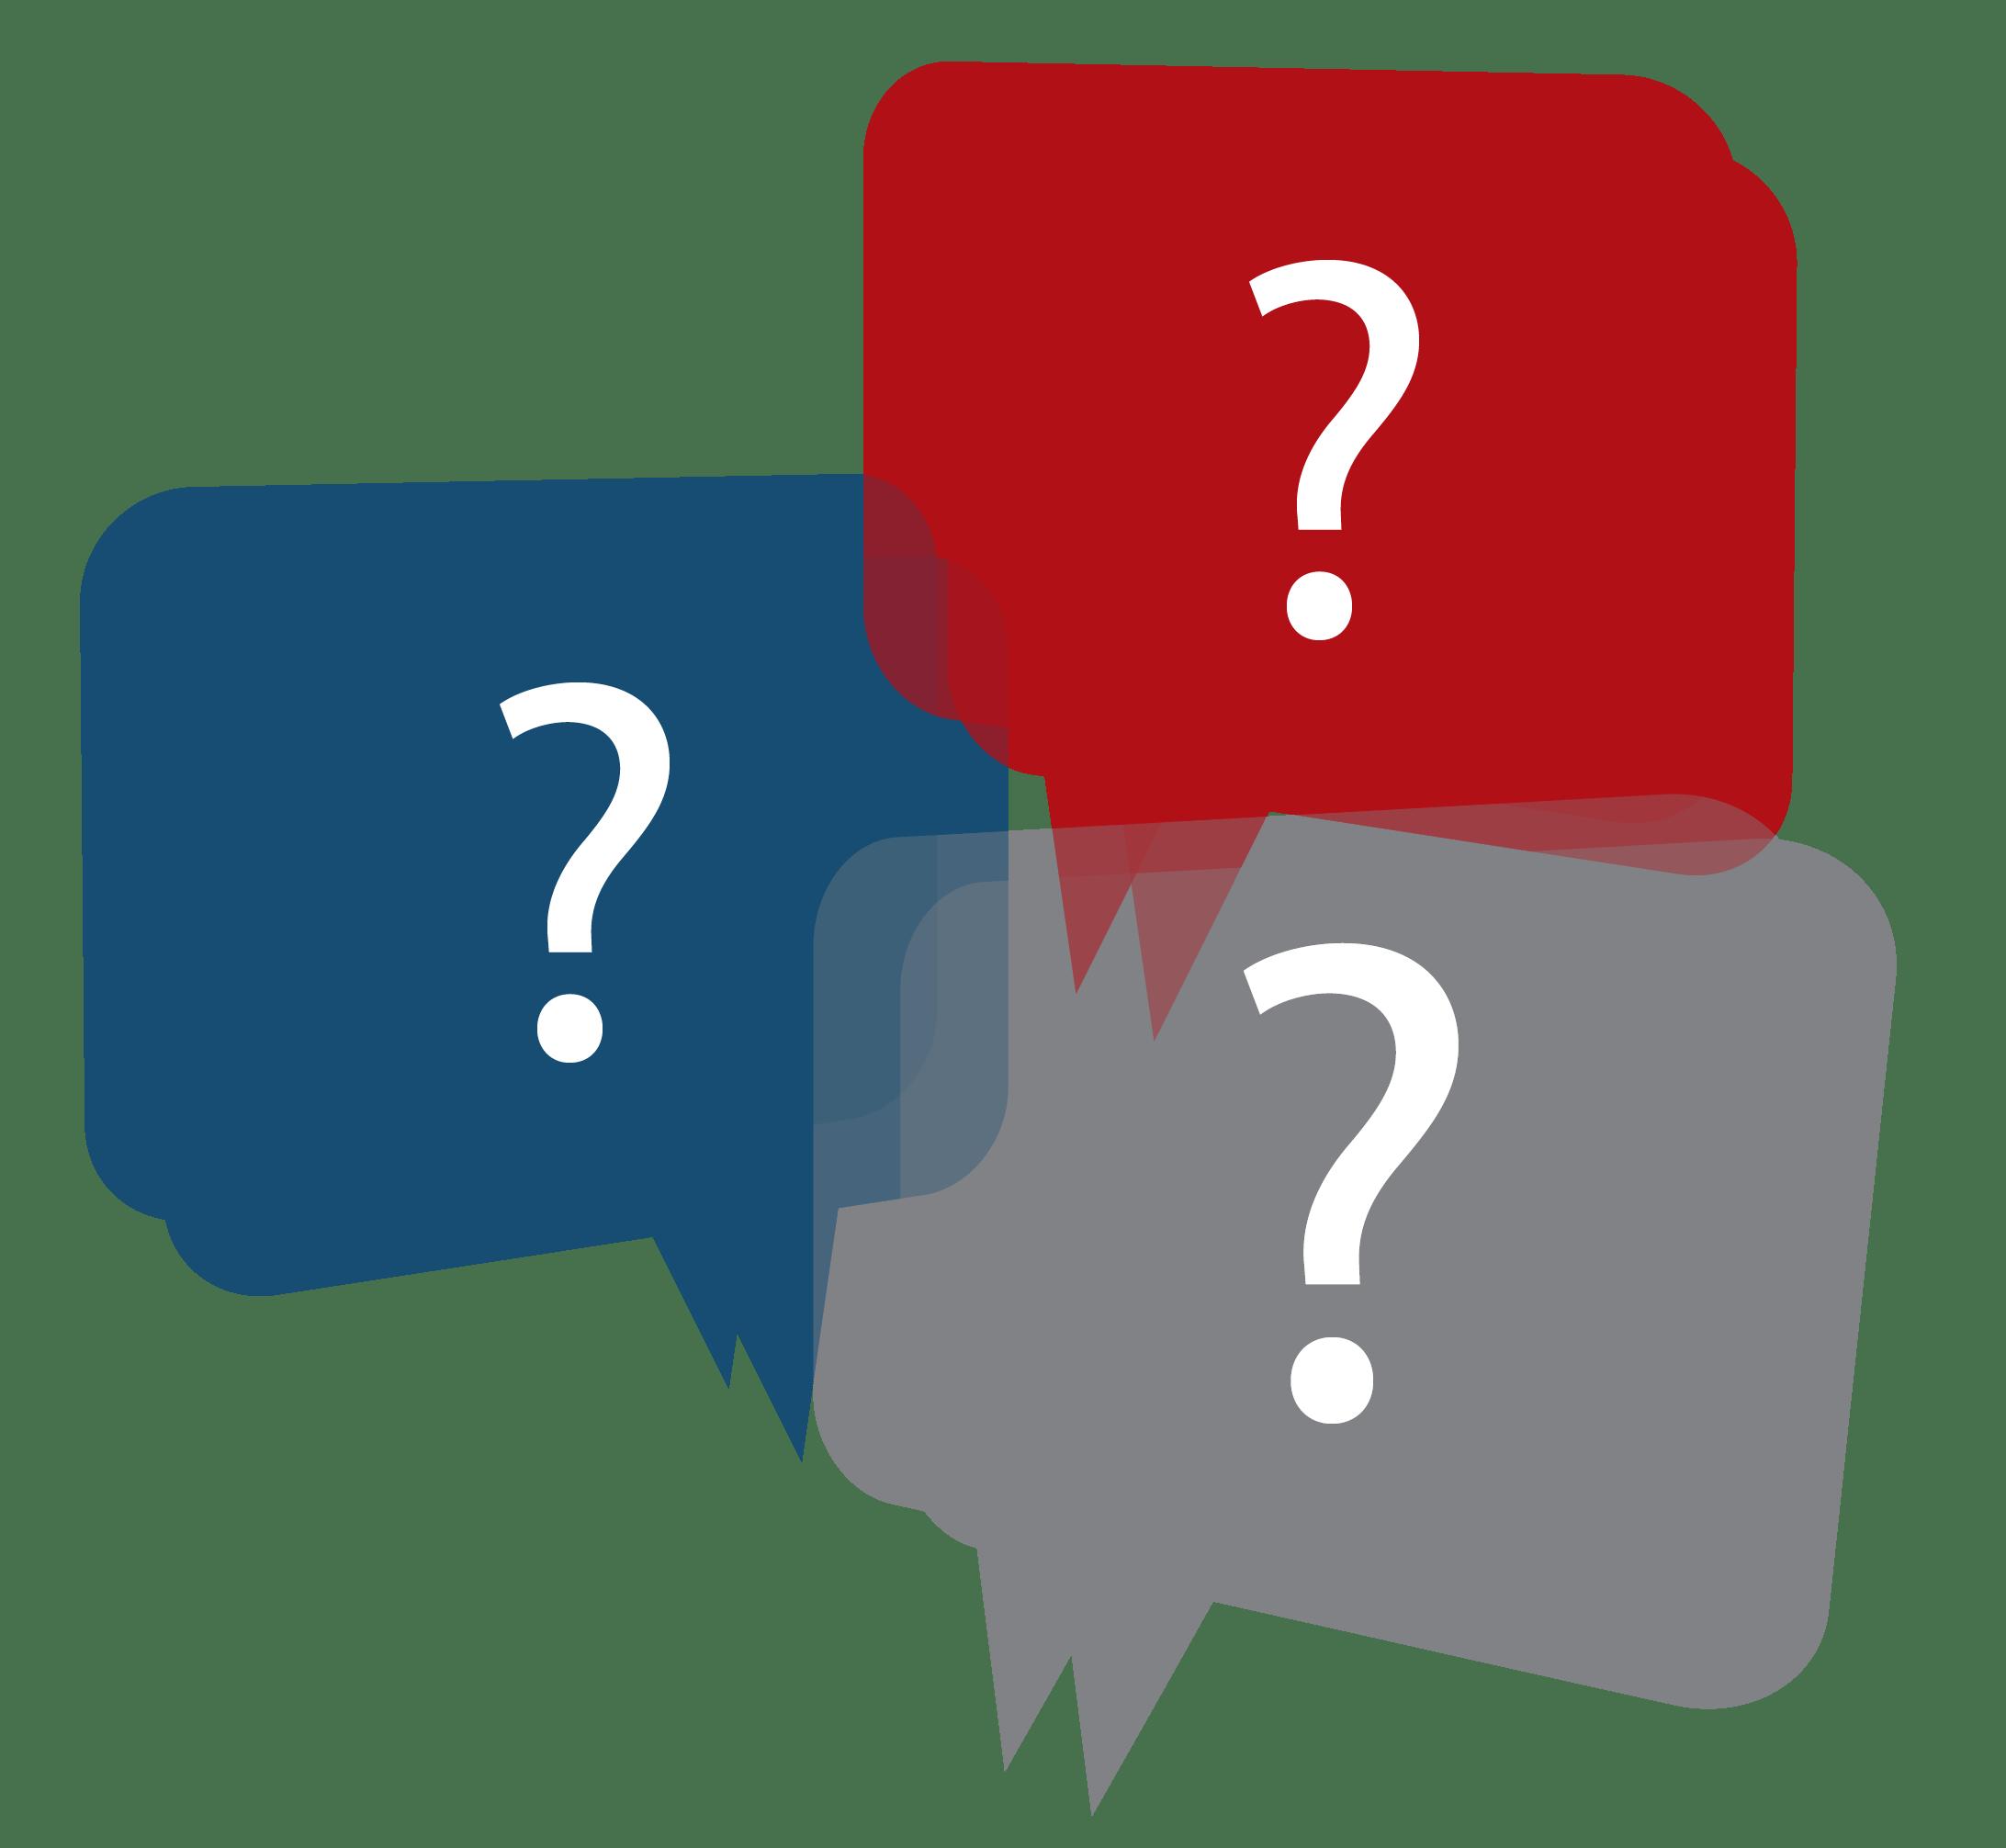 questions-01